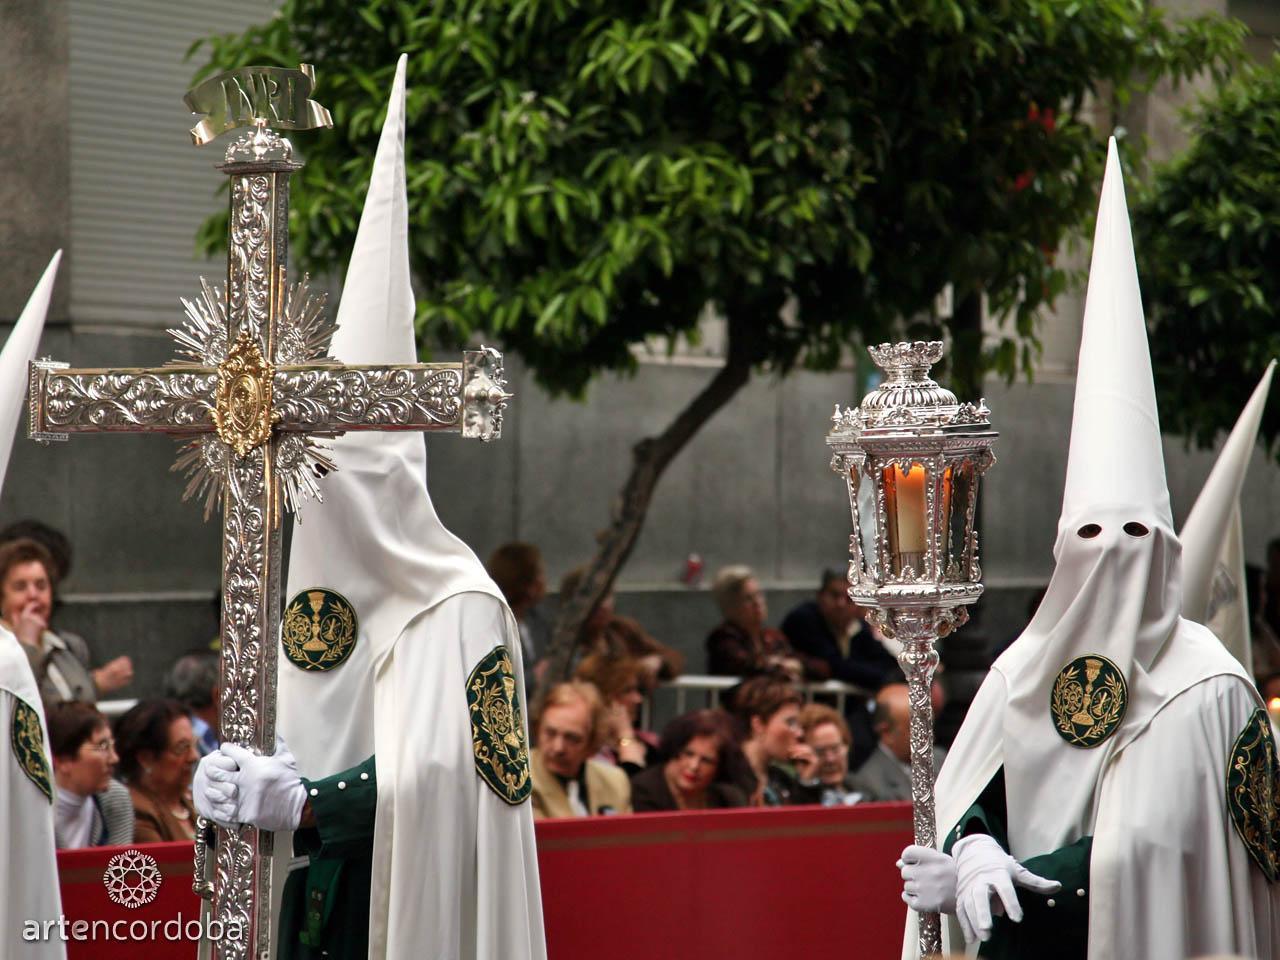 Cruz de Guía de la Hermandad de la Esperanza de Córdoba